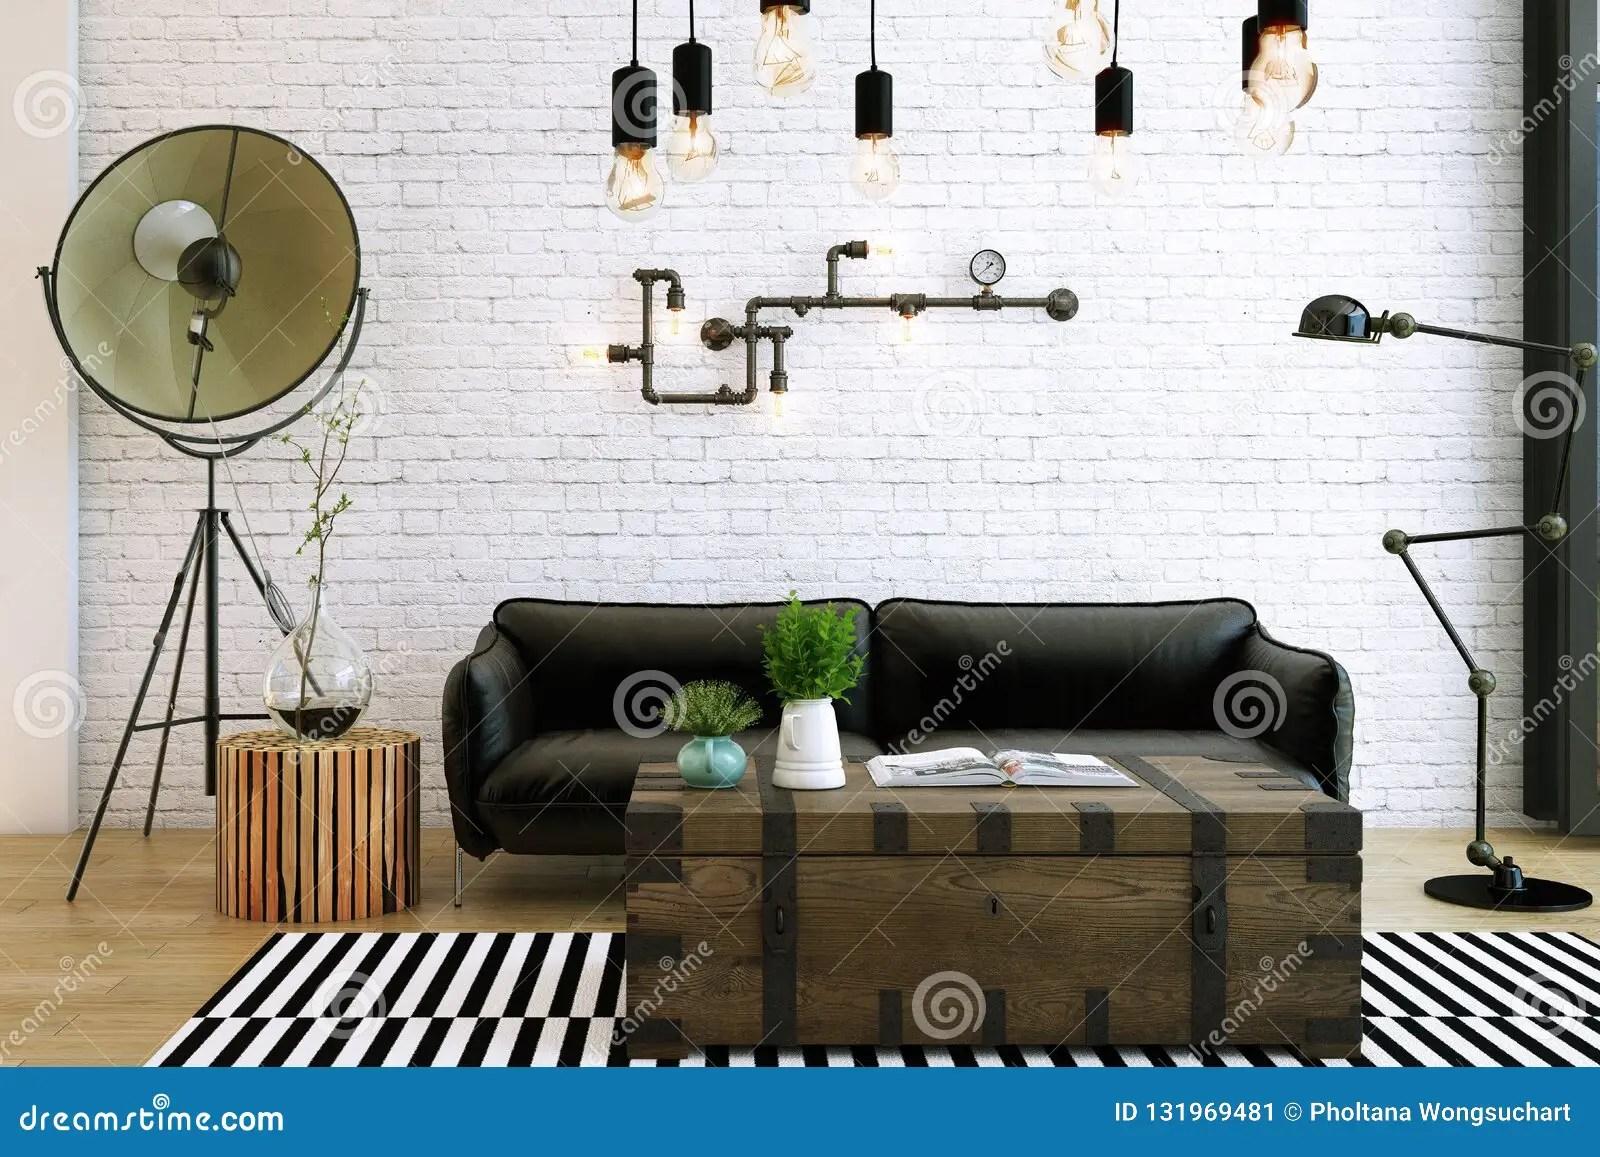 Livingroom Design Interior Of Industrial Style Stock Illustration Illustration Of Lifestyle Loft 131969481